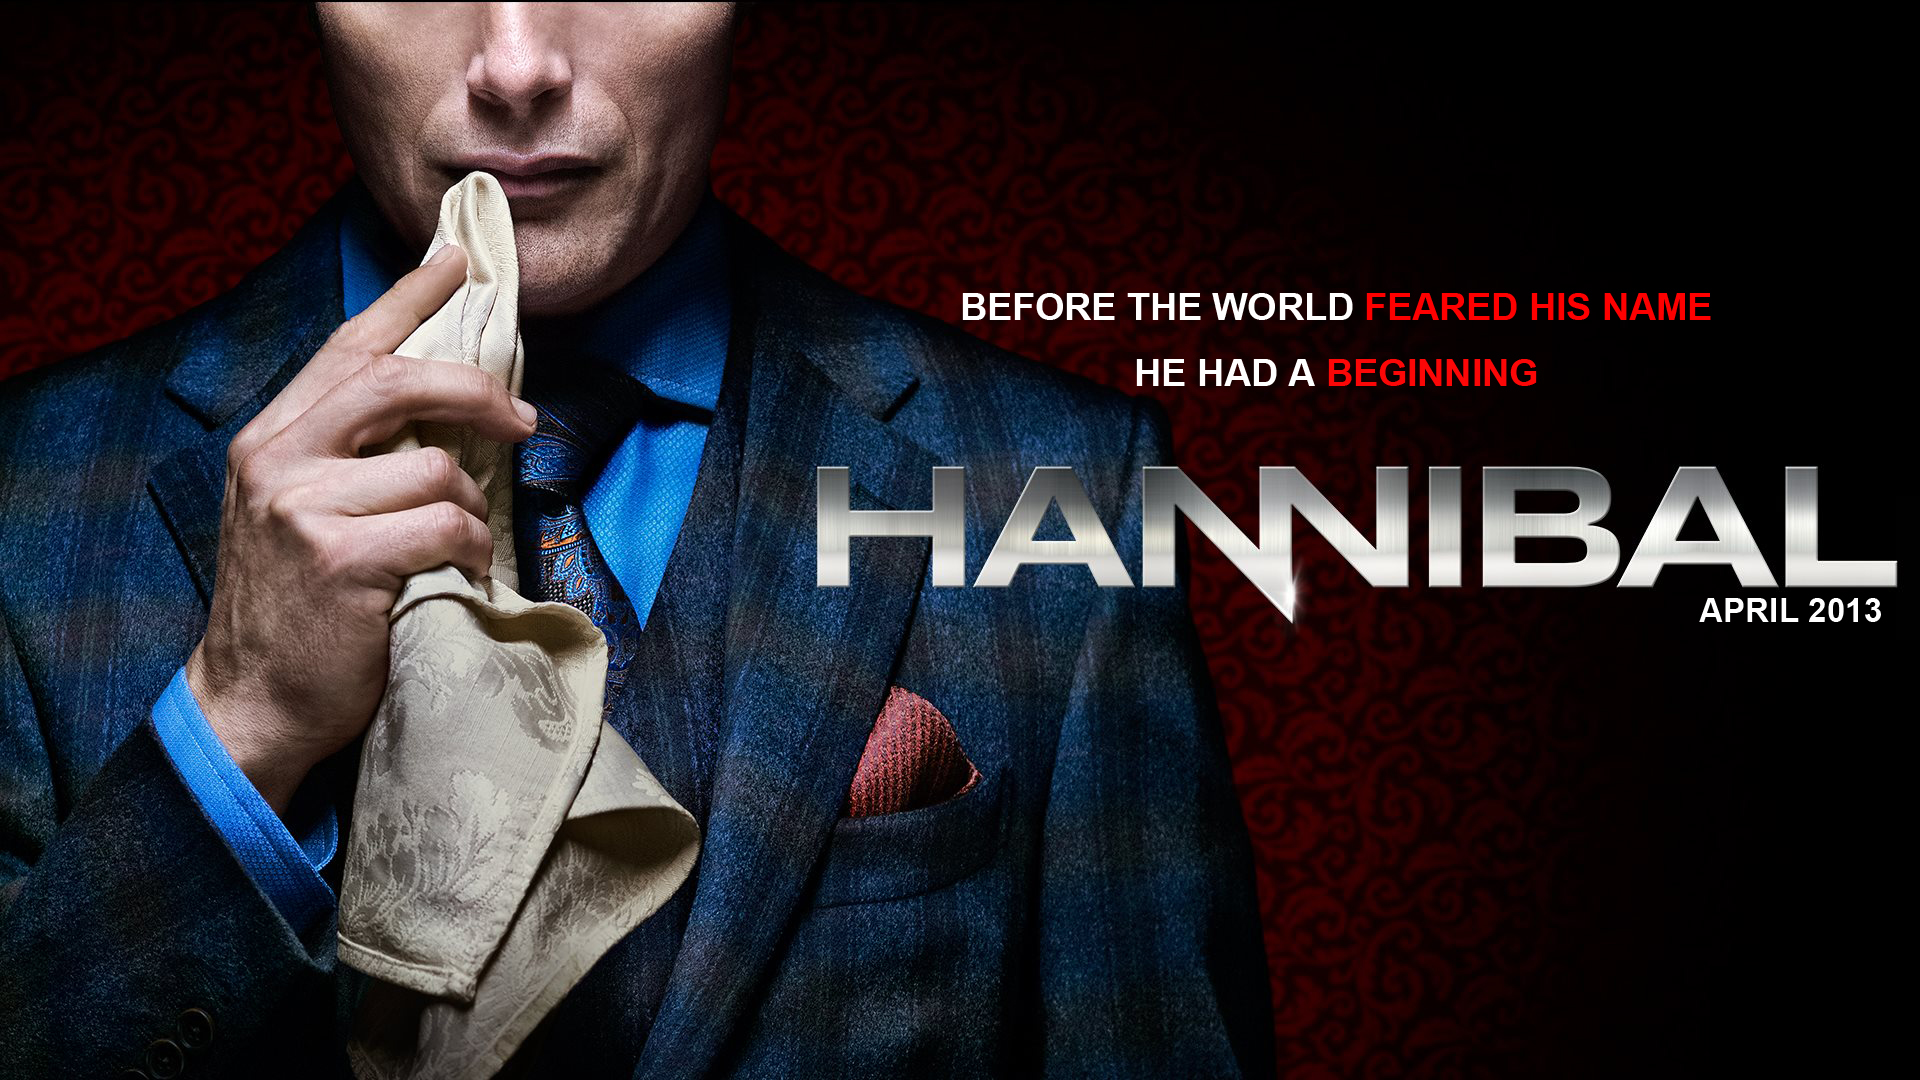 Hannibal wallpaper 5